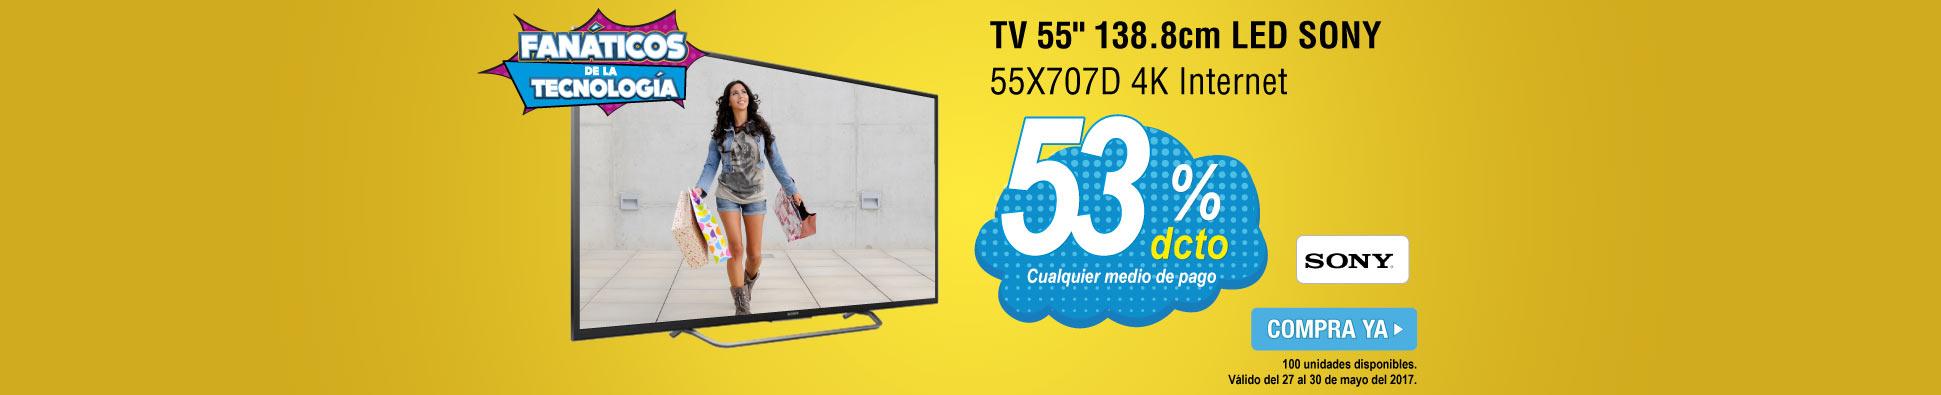 TV 55 138.8cm LED SONY 55X707D 4K Internet -banner opcional